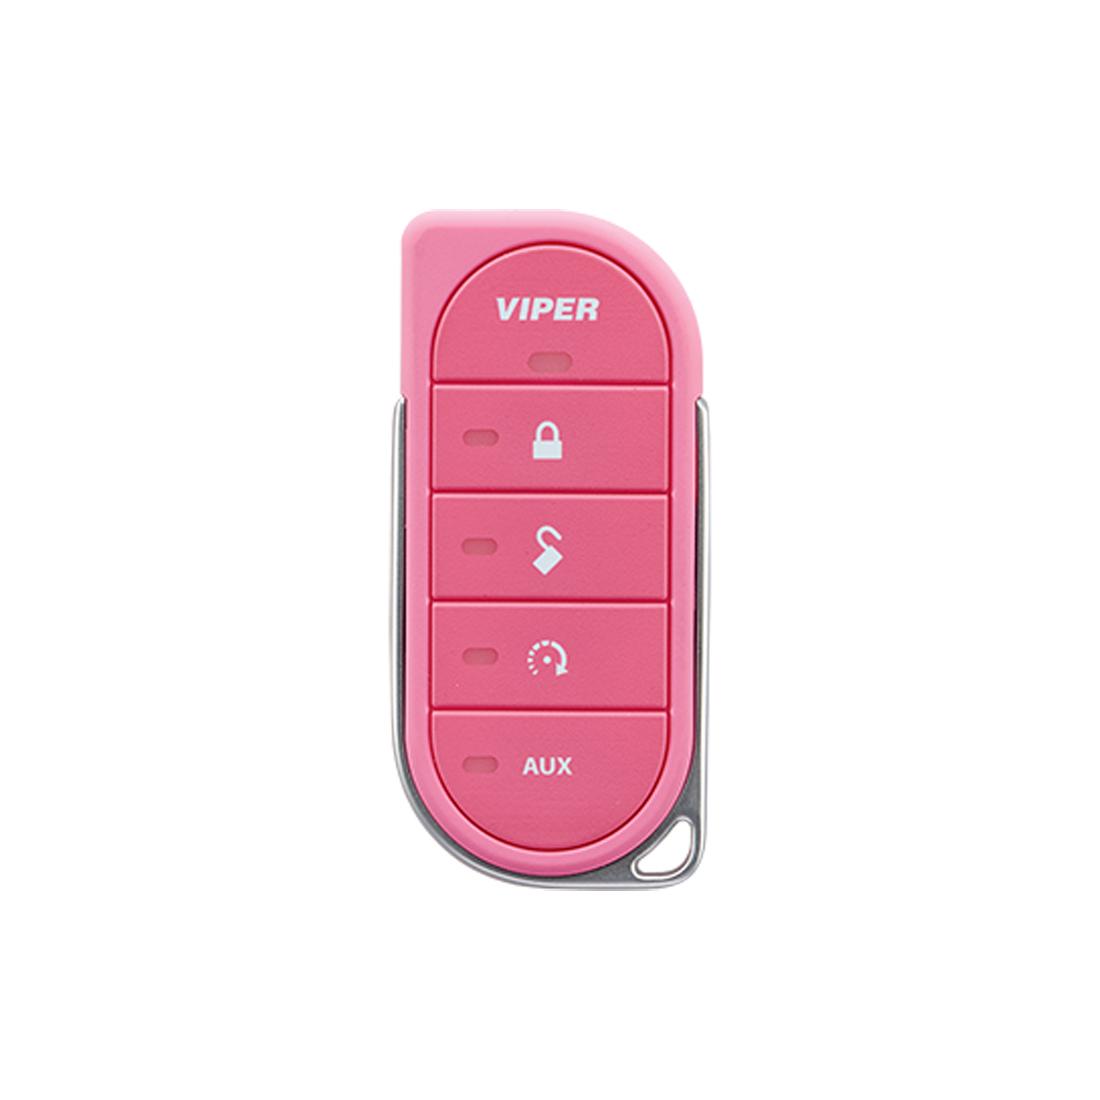 Viper Pink Replacement Remote Canada